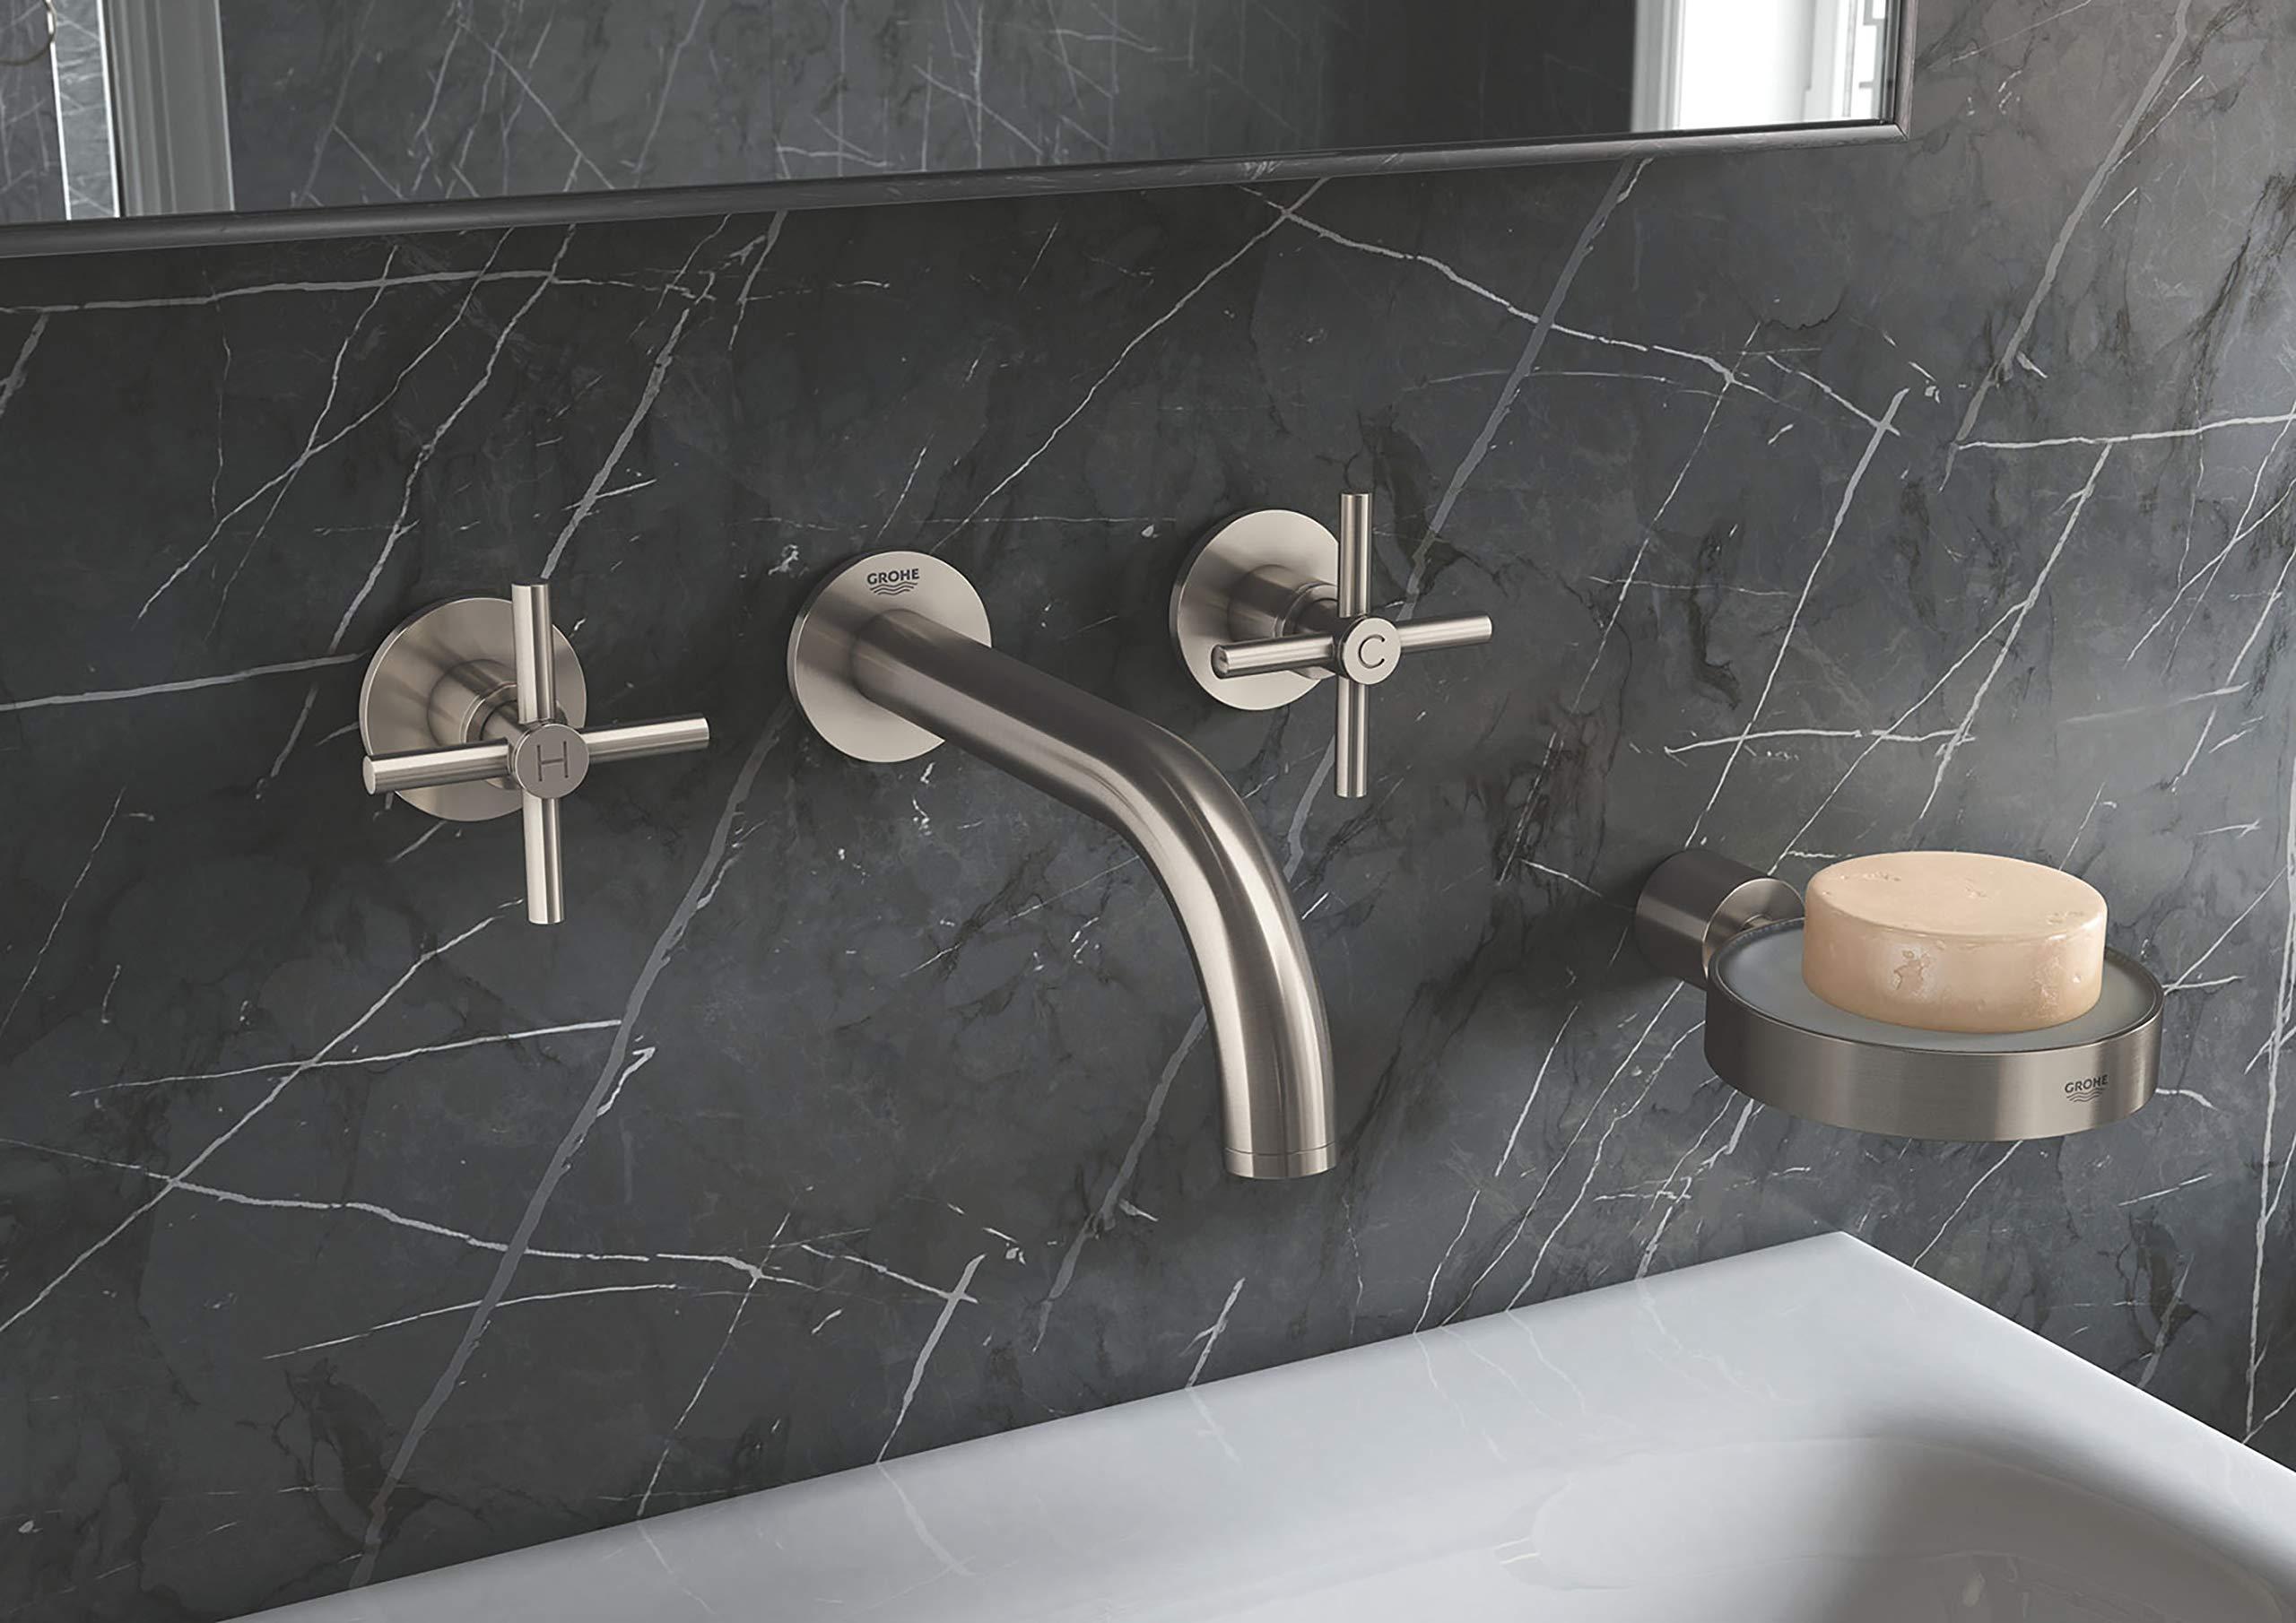 Grohe 18026EN3 Atrio Bathroom Faucet Cross Handles, Brushed Nickel by GROHE (Image #7)